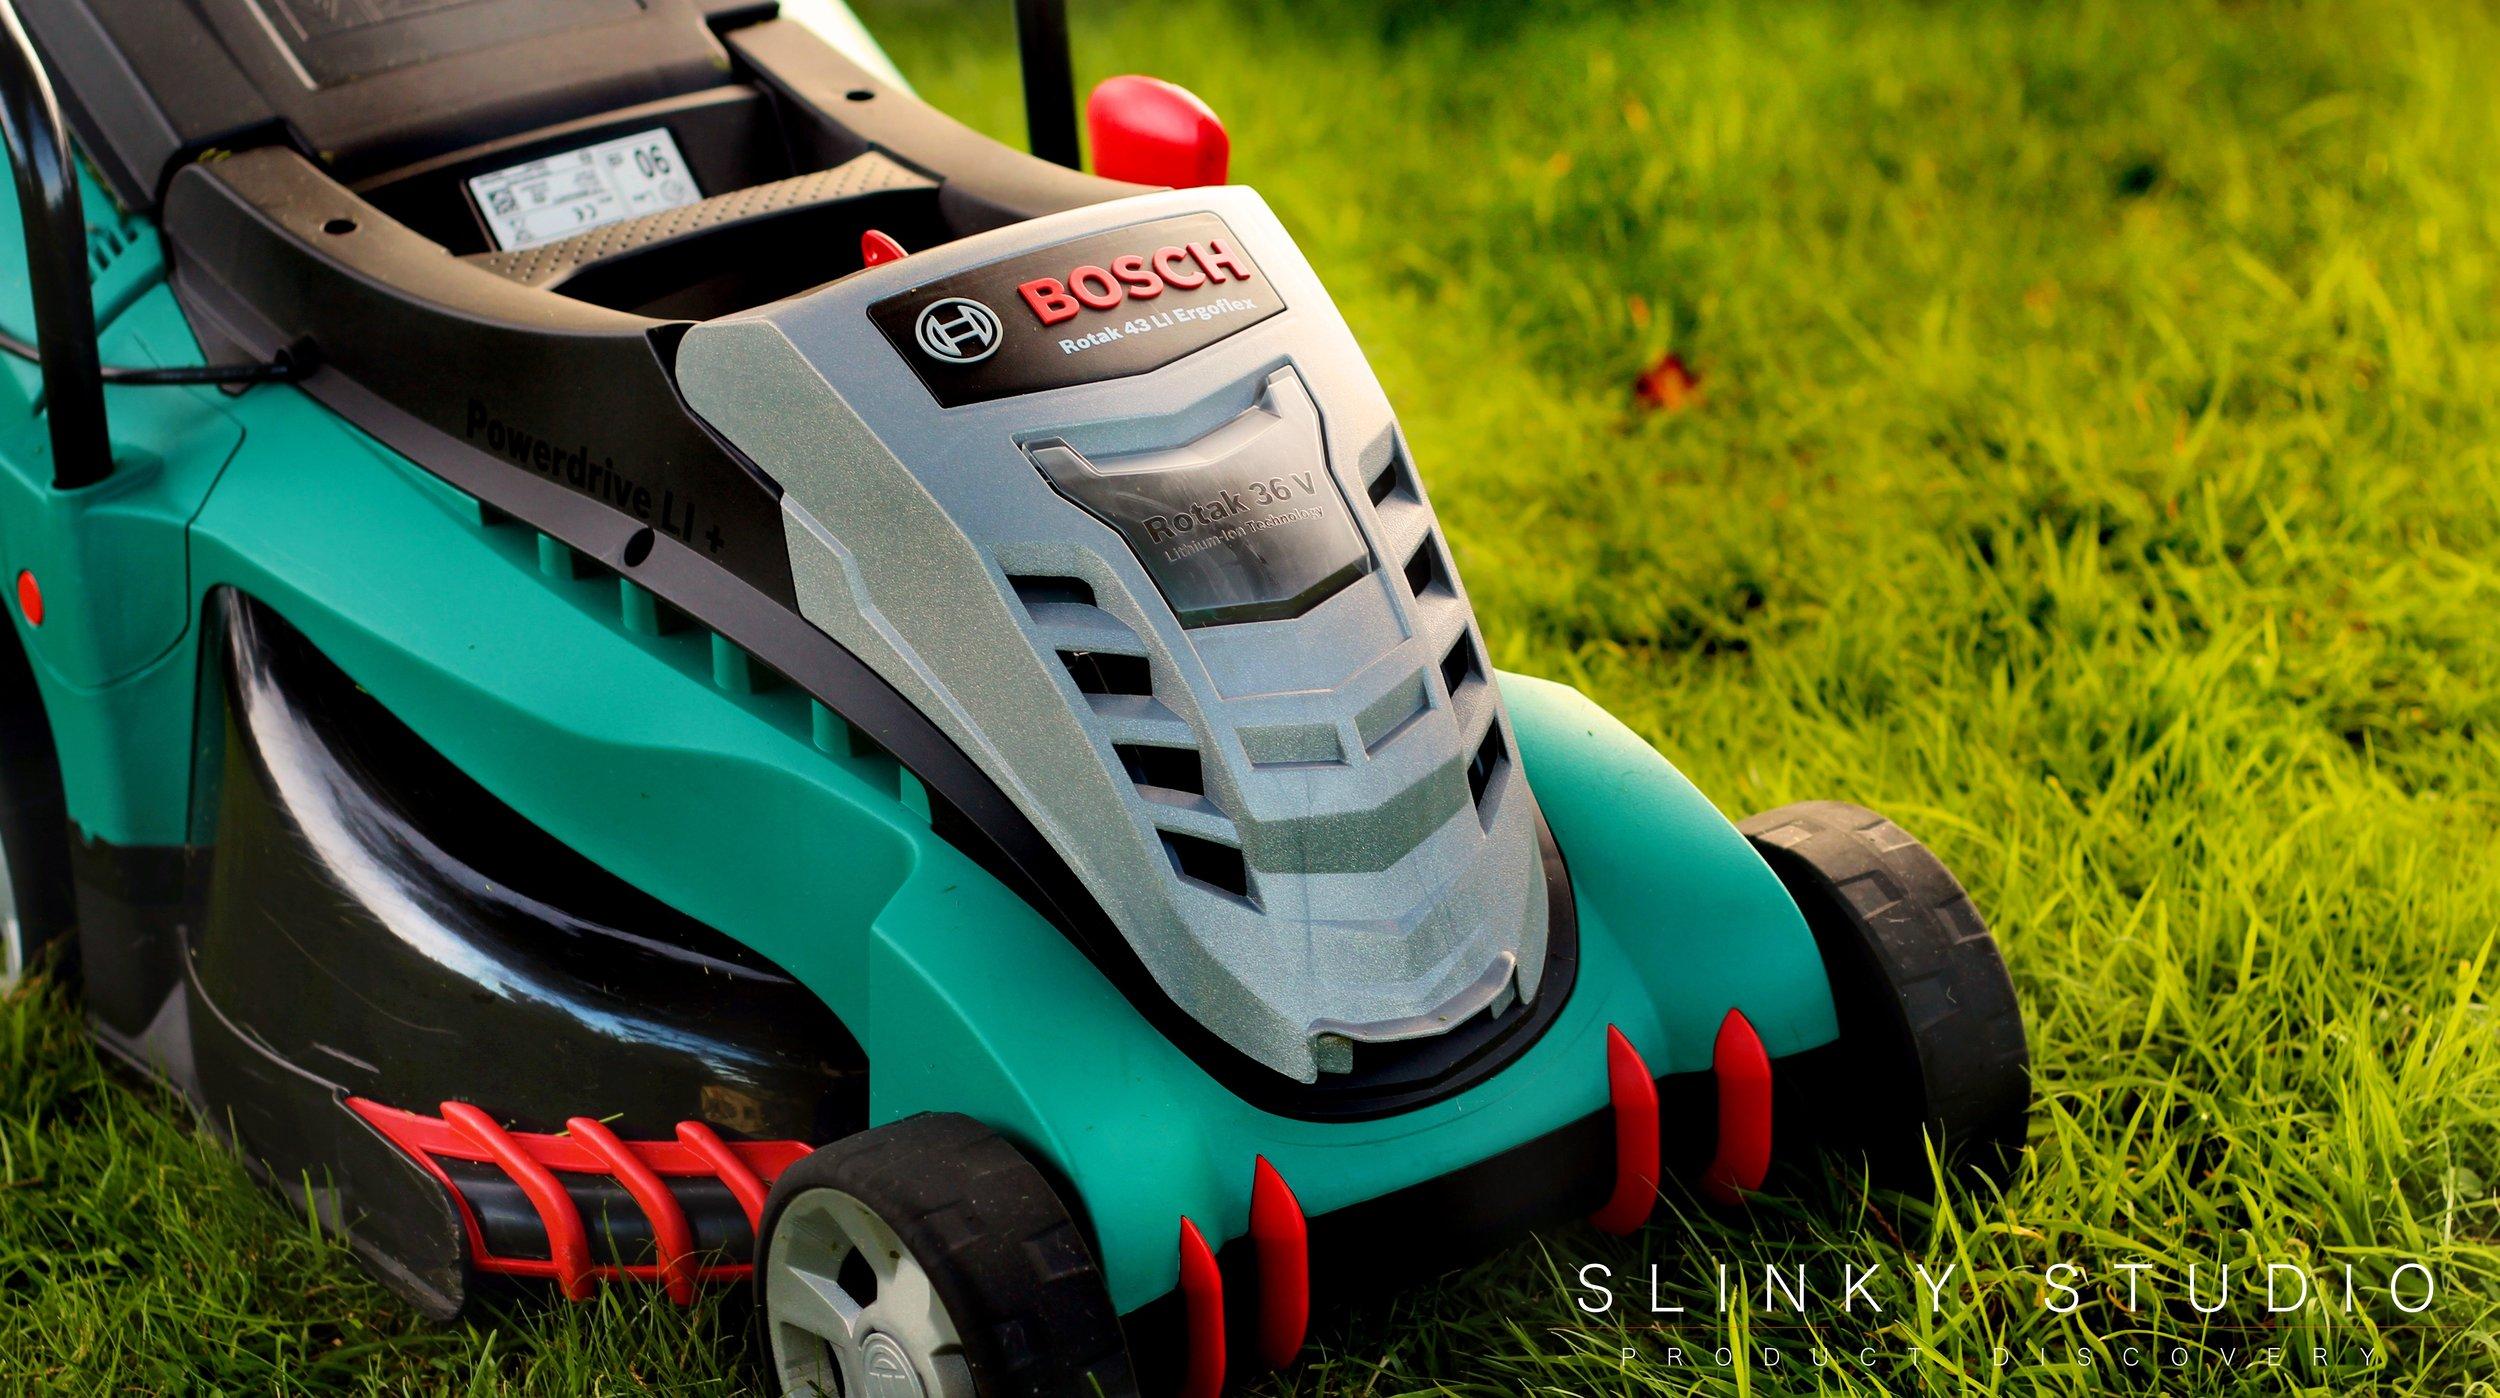 Bosch Rotak 43 LI Ergoflex Cordless Lawnmower Front Side View.jpg